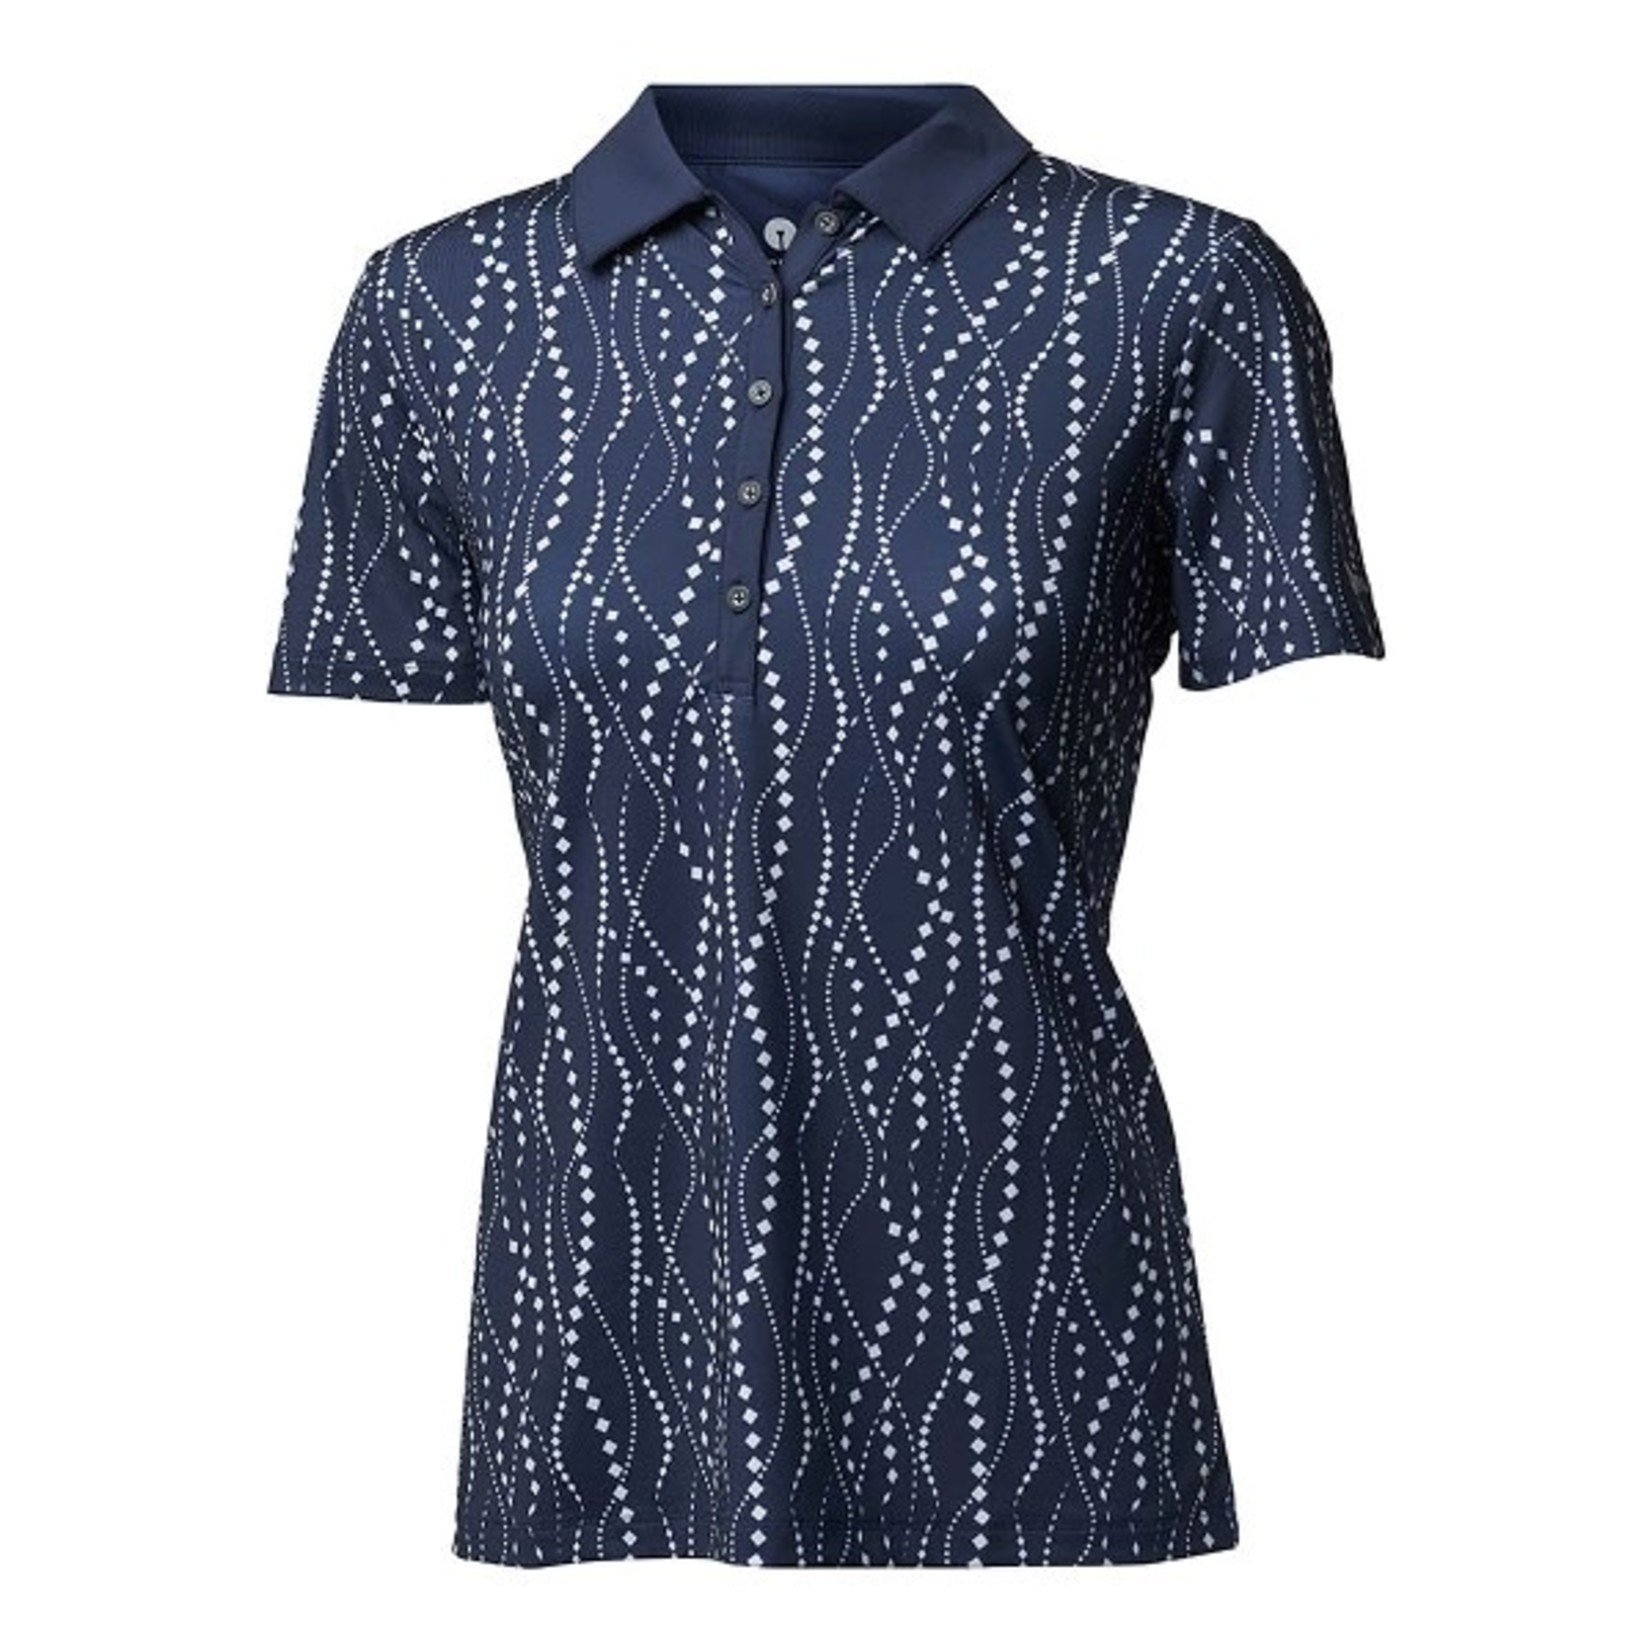 Backtee Backtee Ladies Printed Qd Uv Polo blauw XL